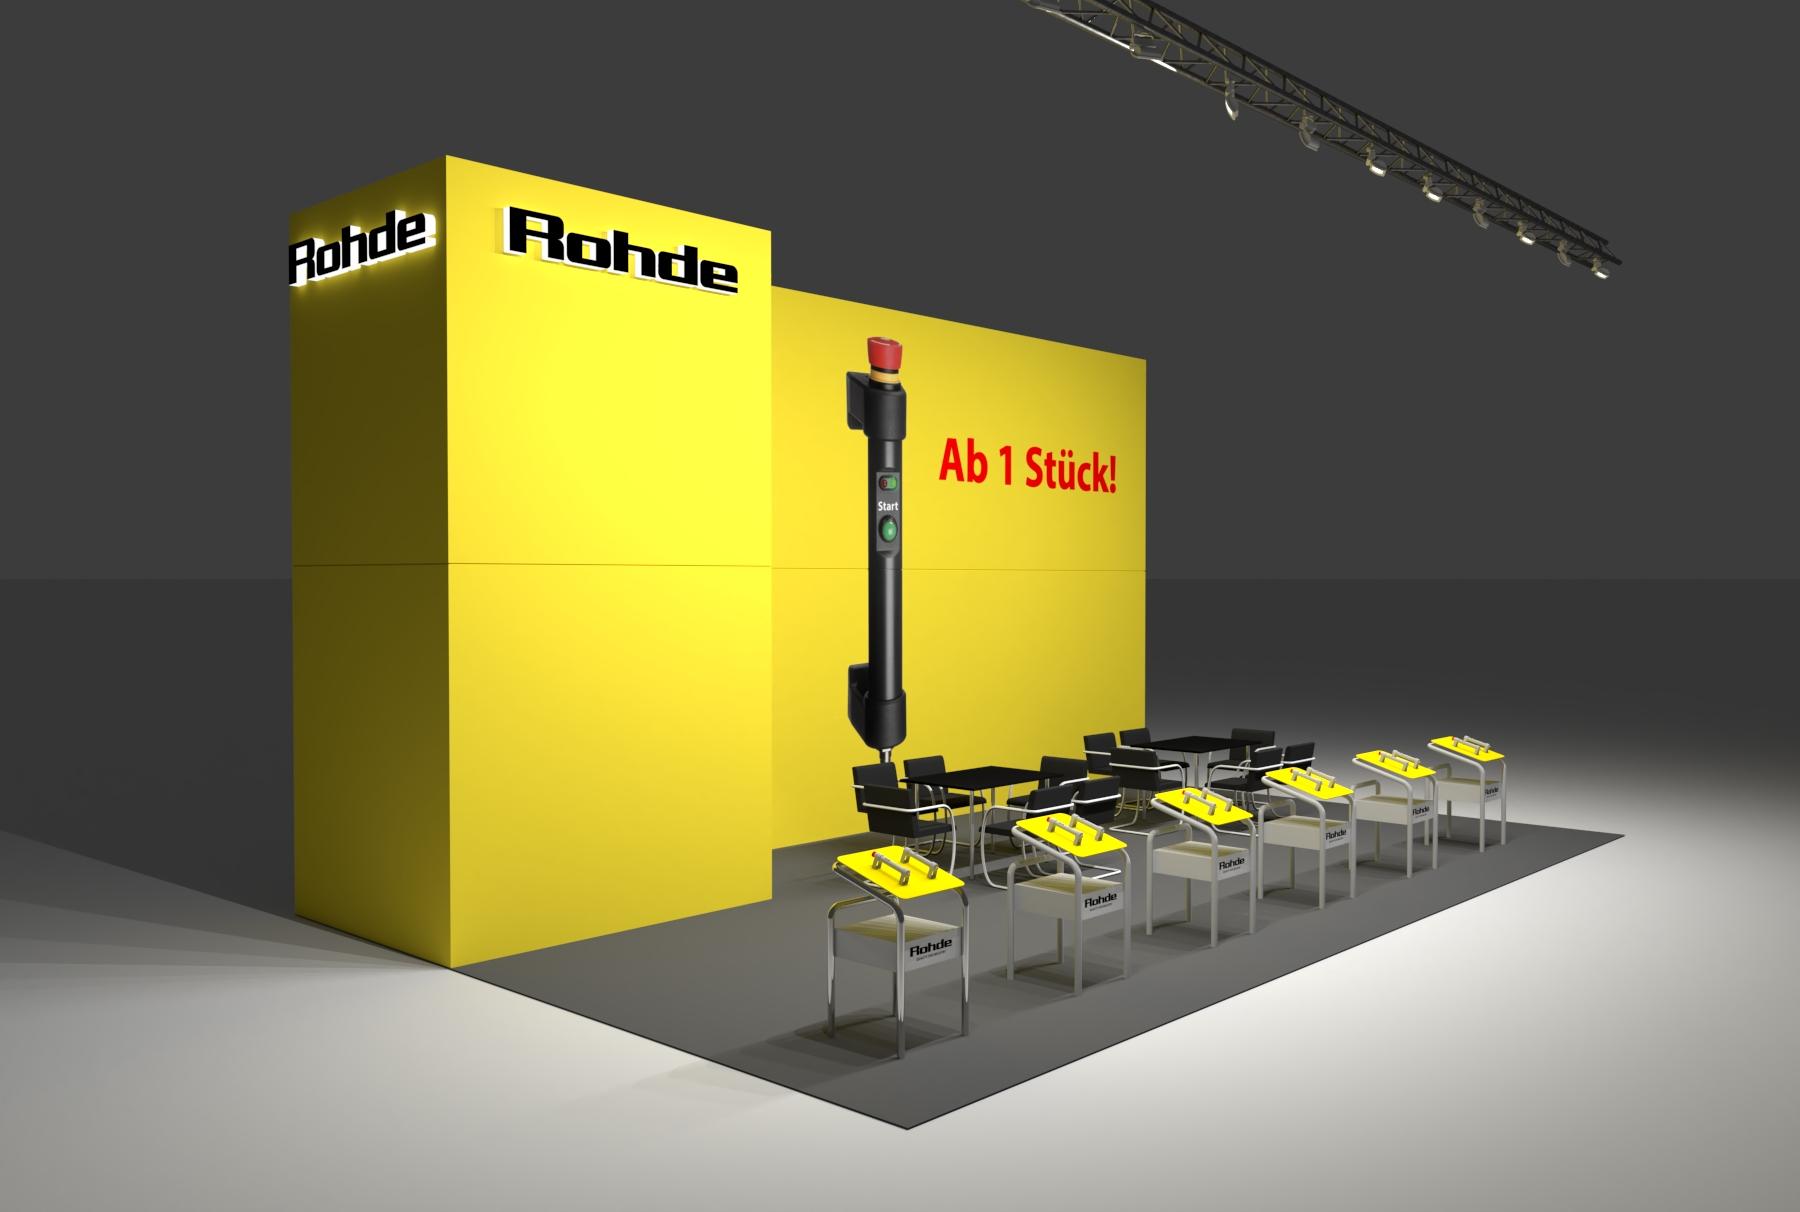 Rohde Messebau Hannover Weber Werbung